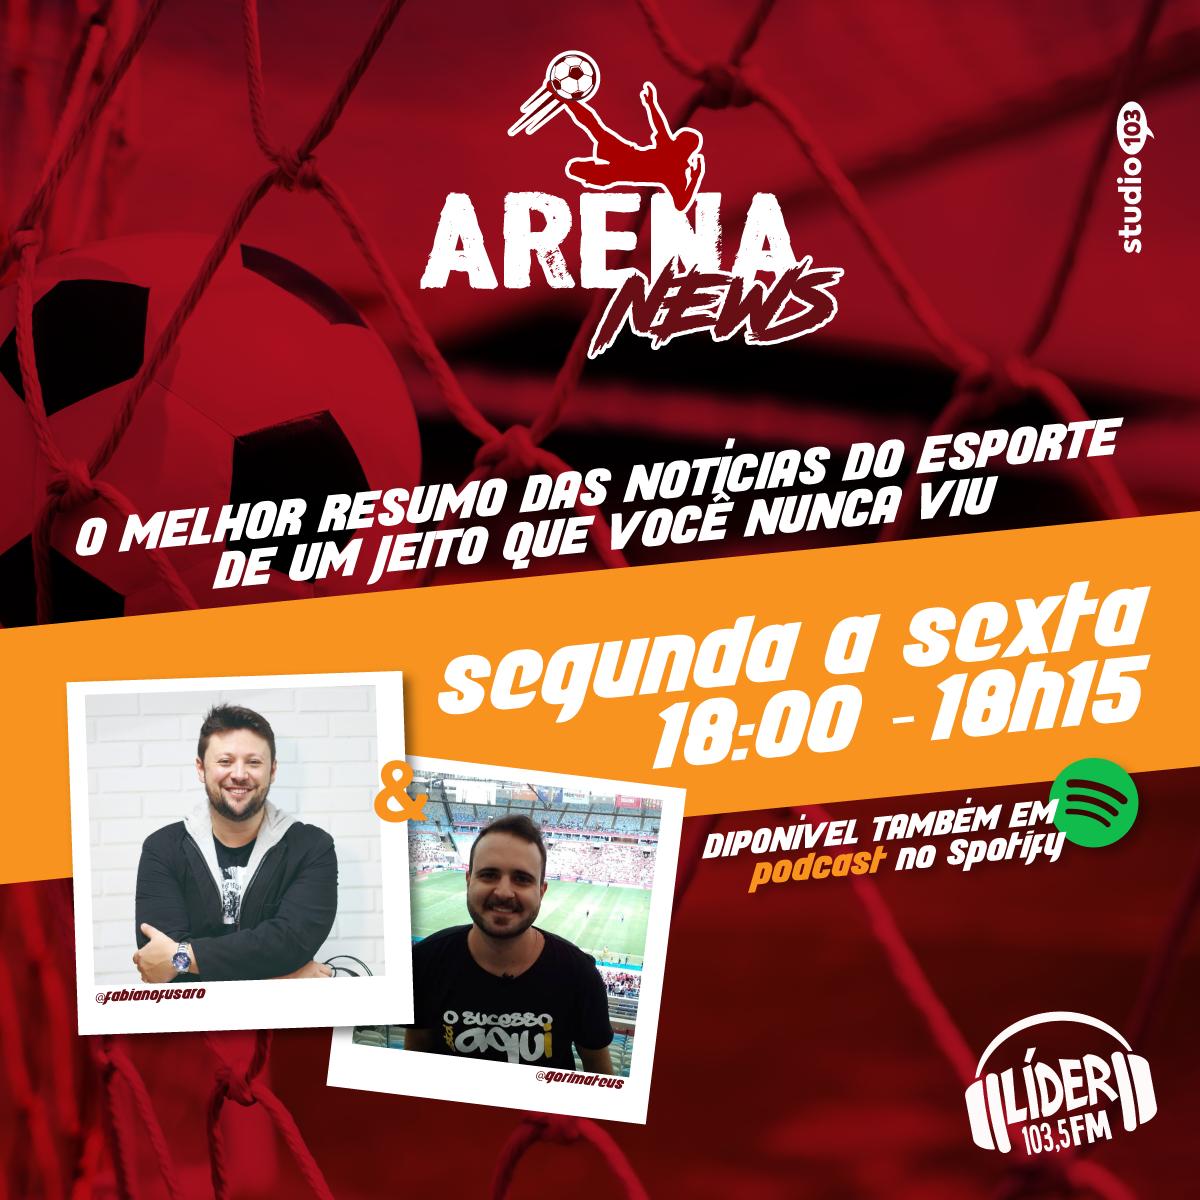 Chamada - Arena News